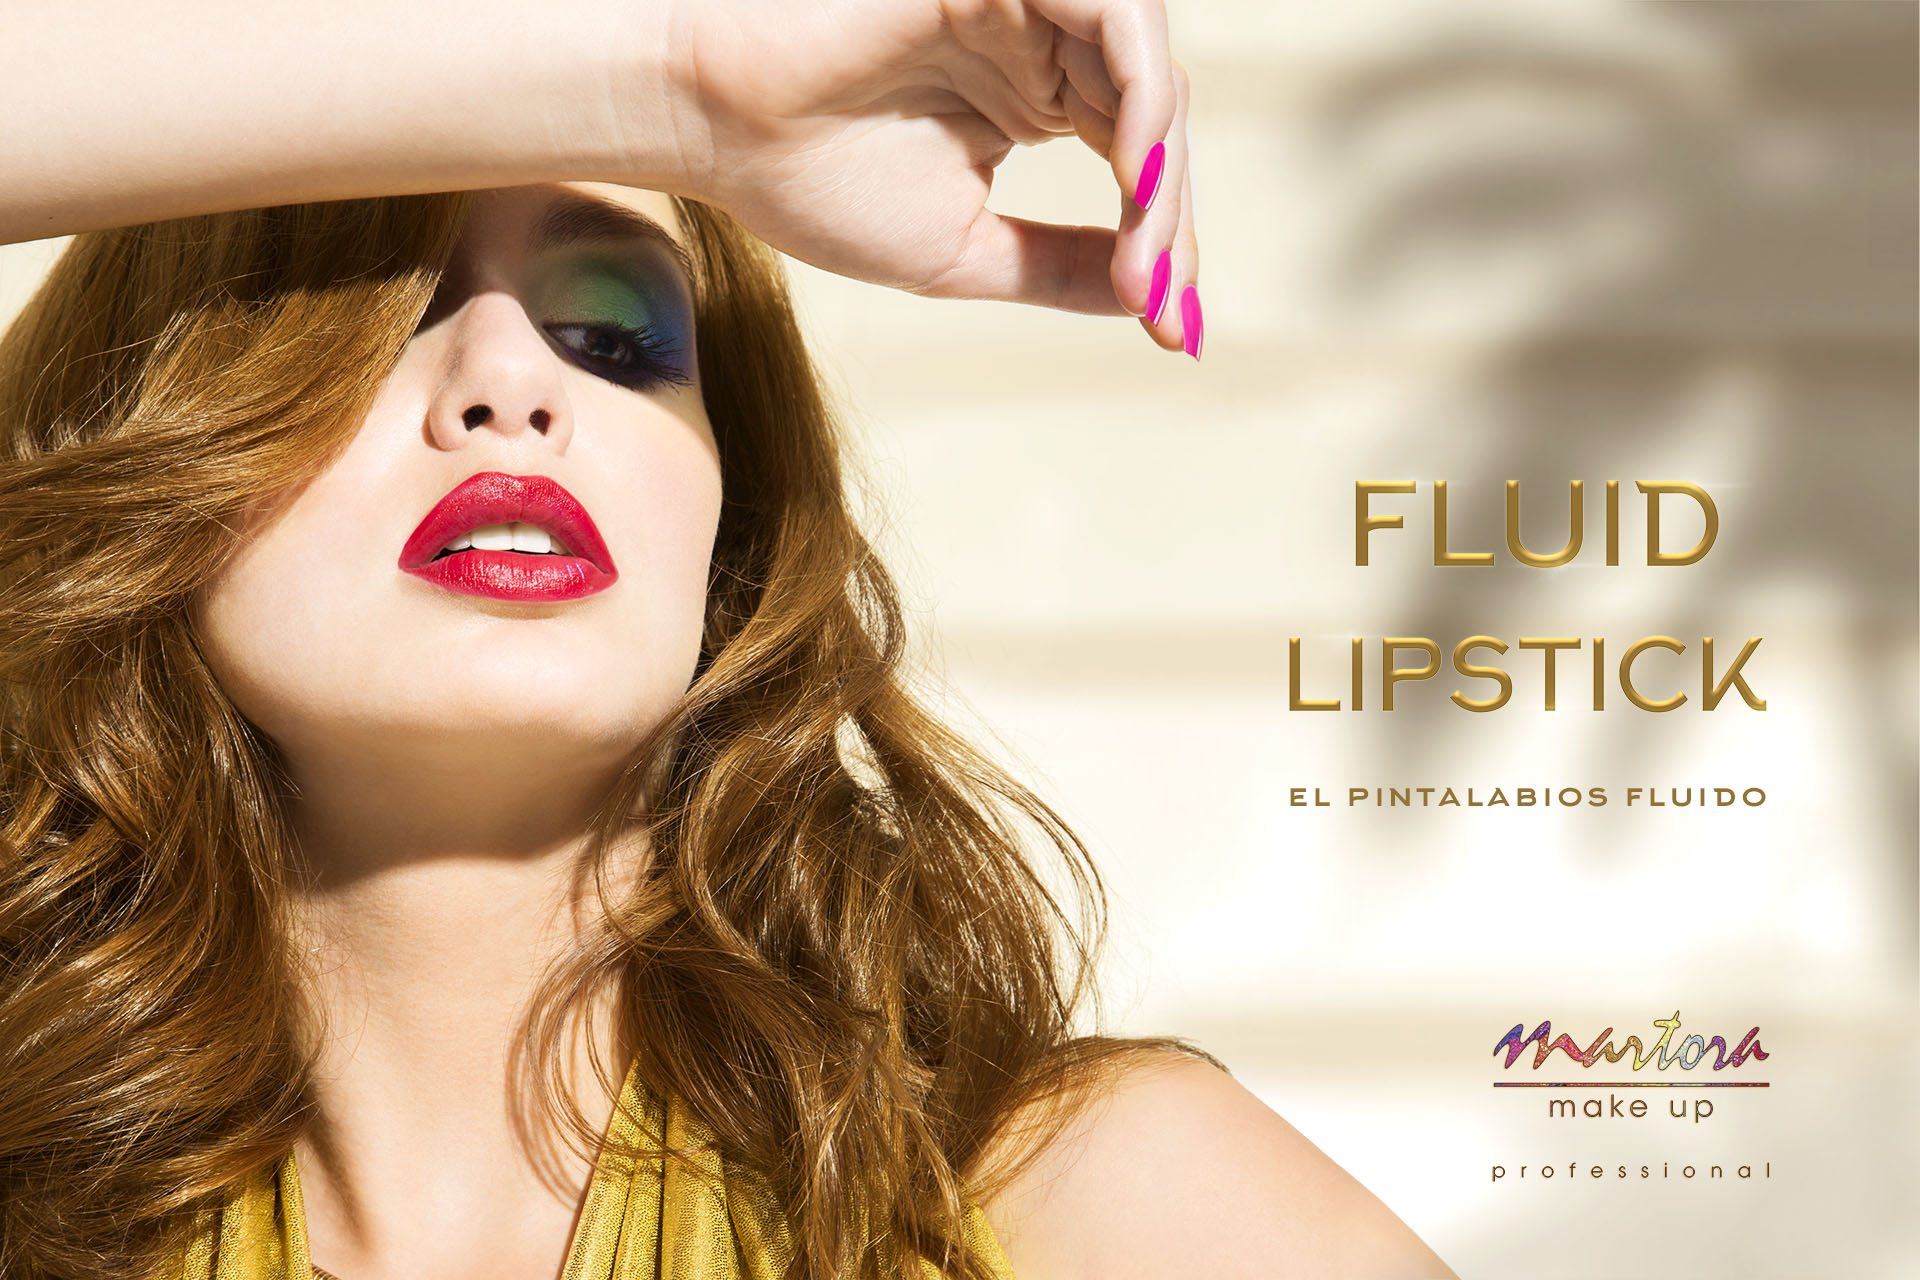 martora-makeup-fluid-lipstick-pintalabios-fluido-1920